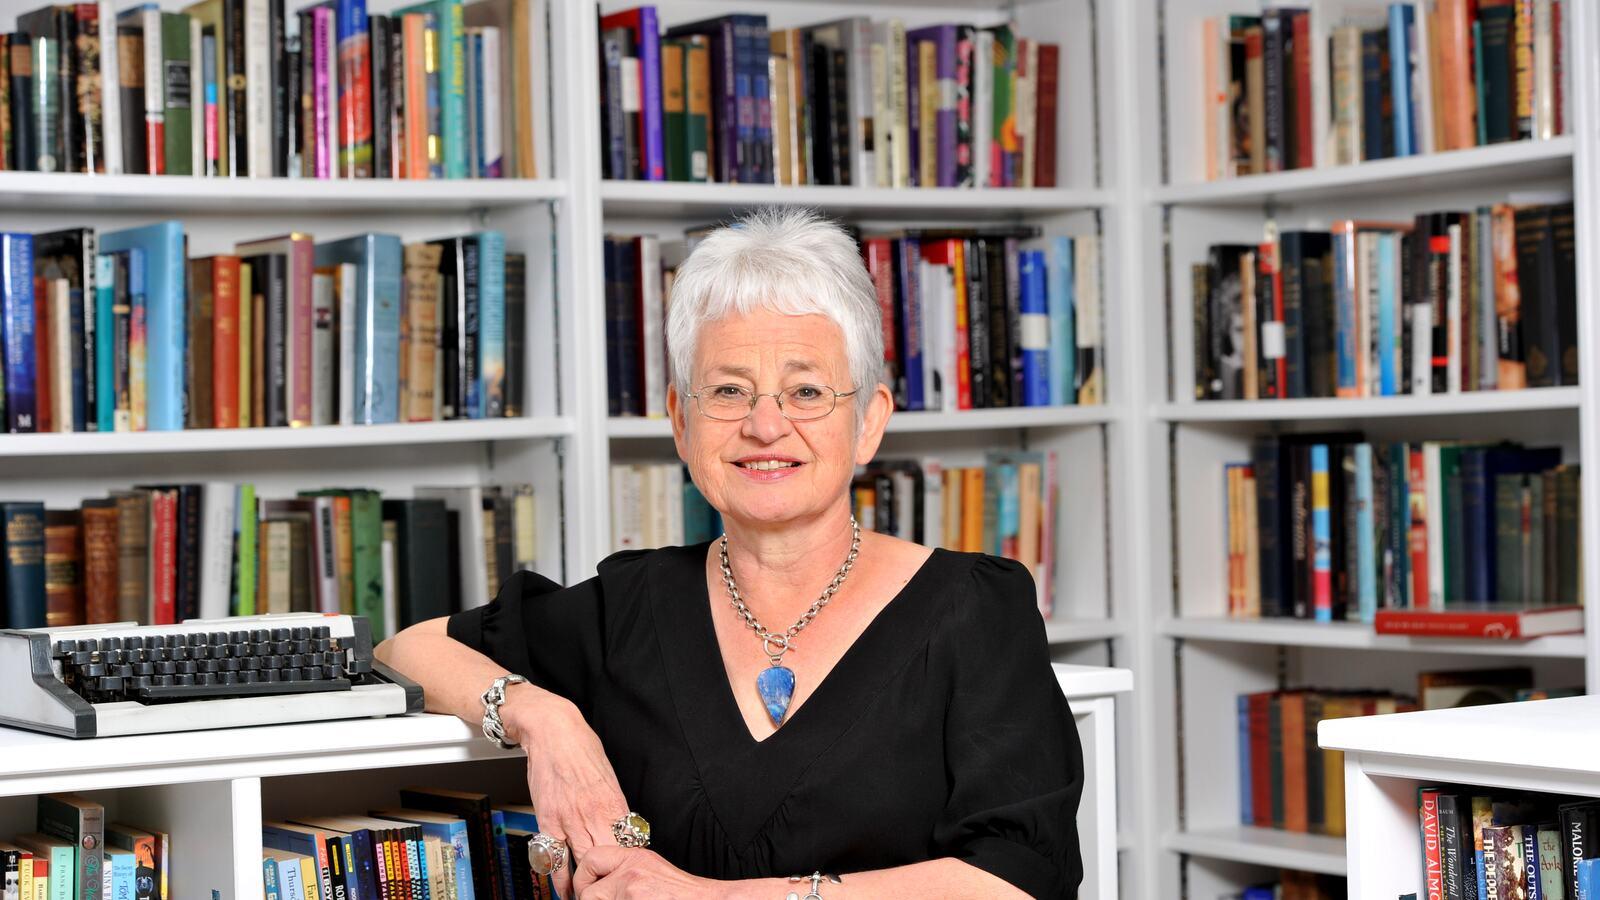 Jacqueline Wilson - July 2012 . ©James Jordan